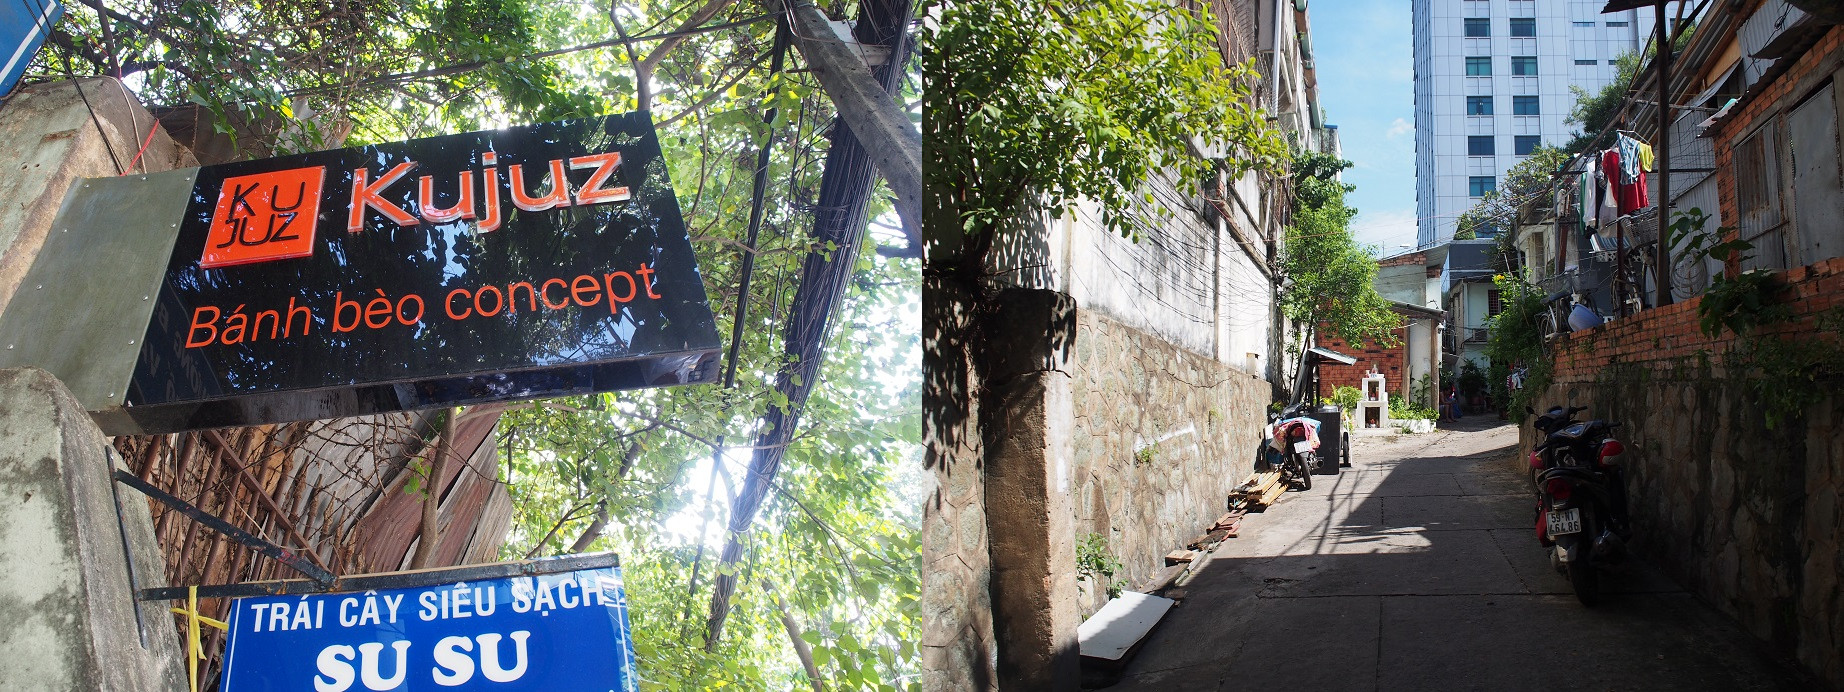 「Kujuz Banh beo concept」の看板と路地の入口